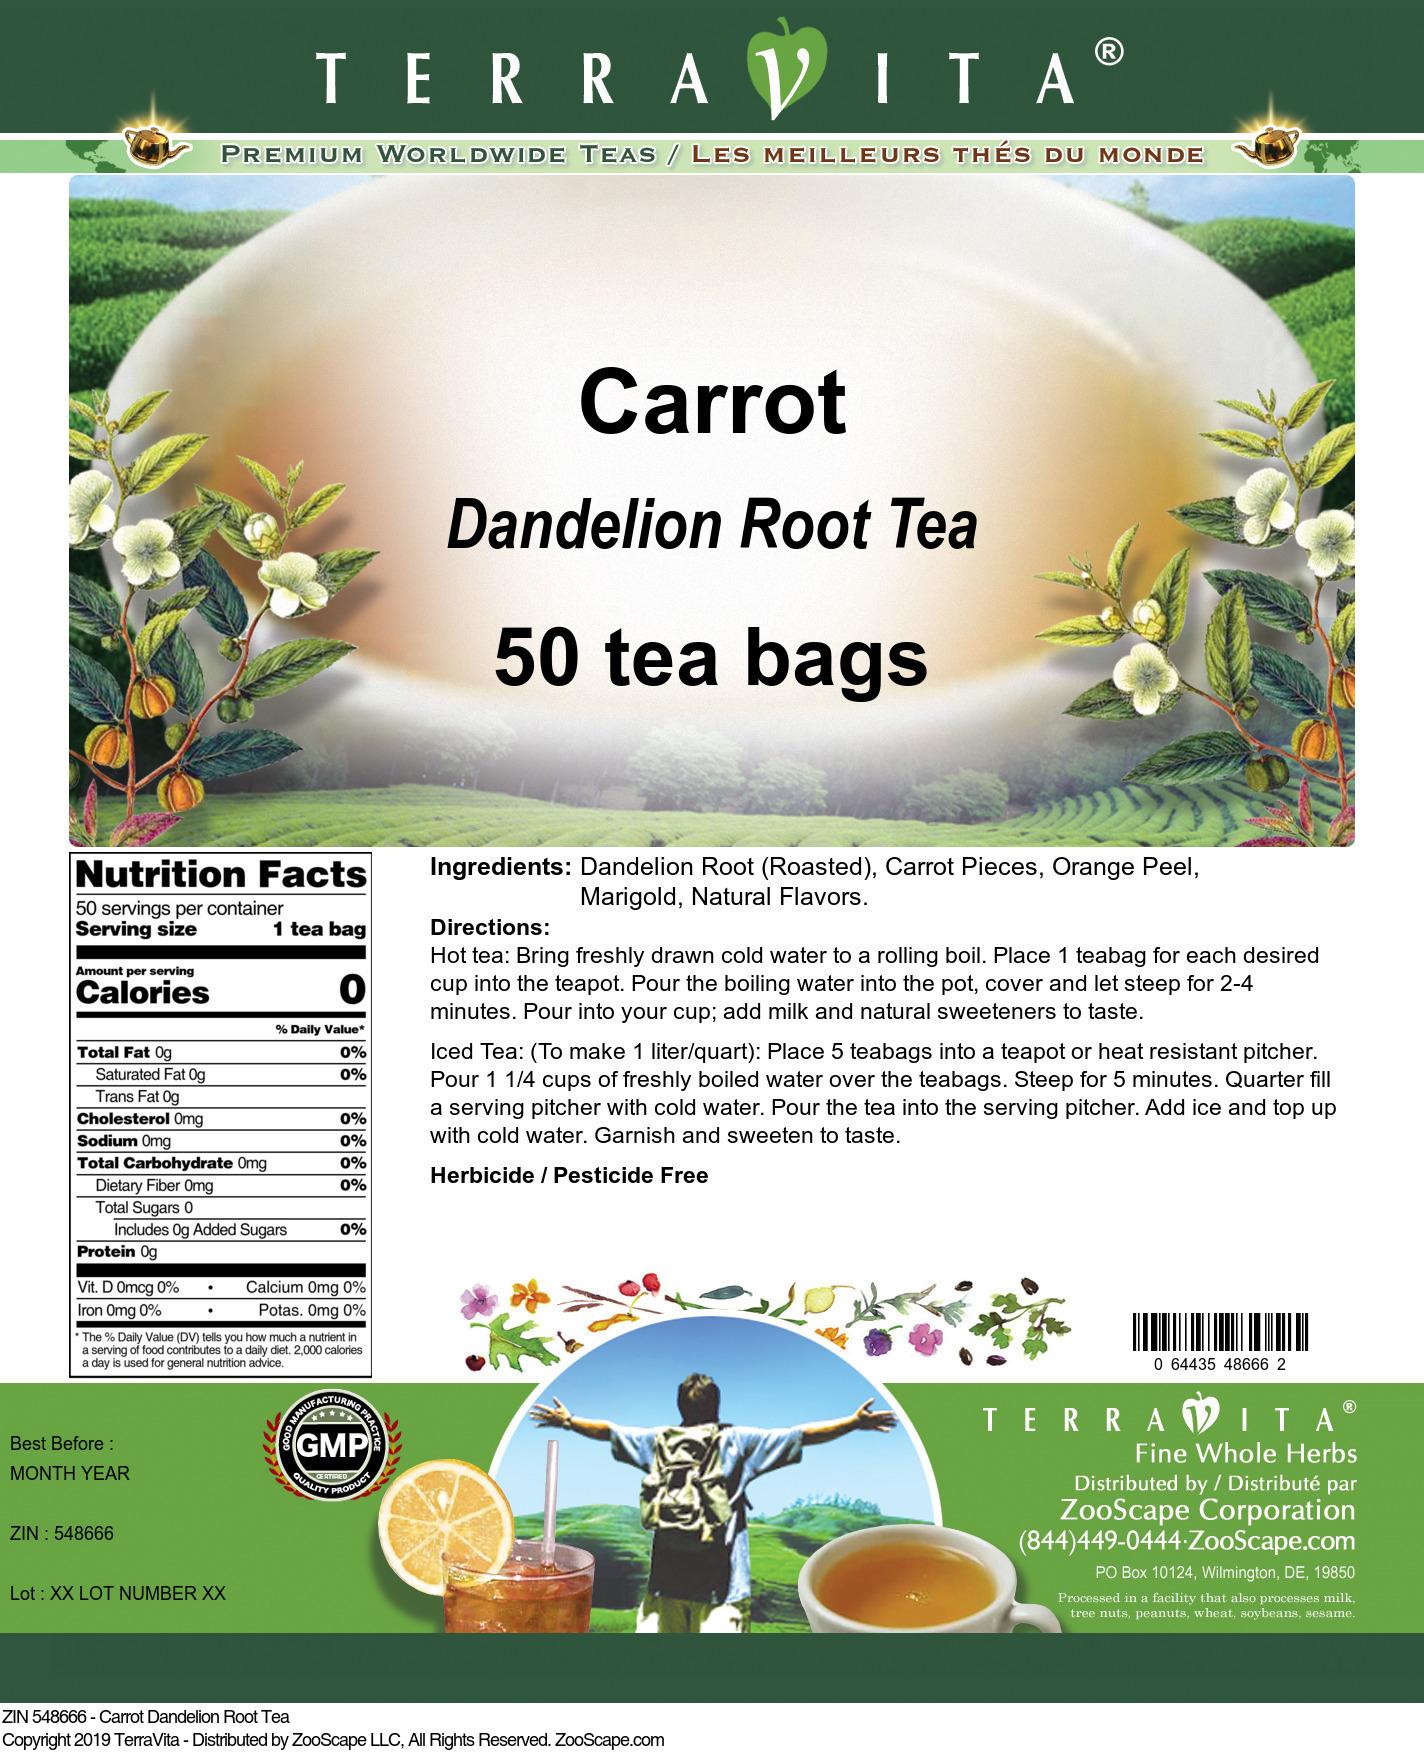 Carrot Dandelion Root